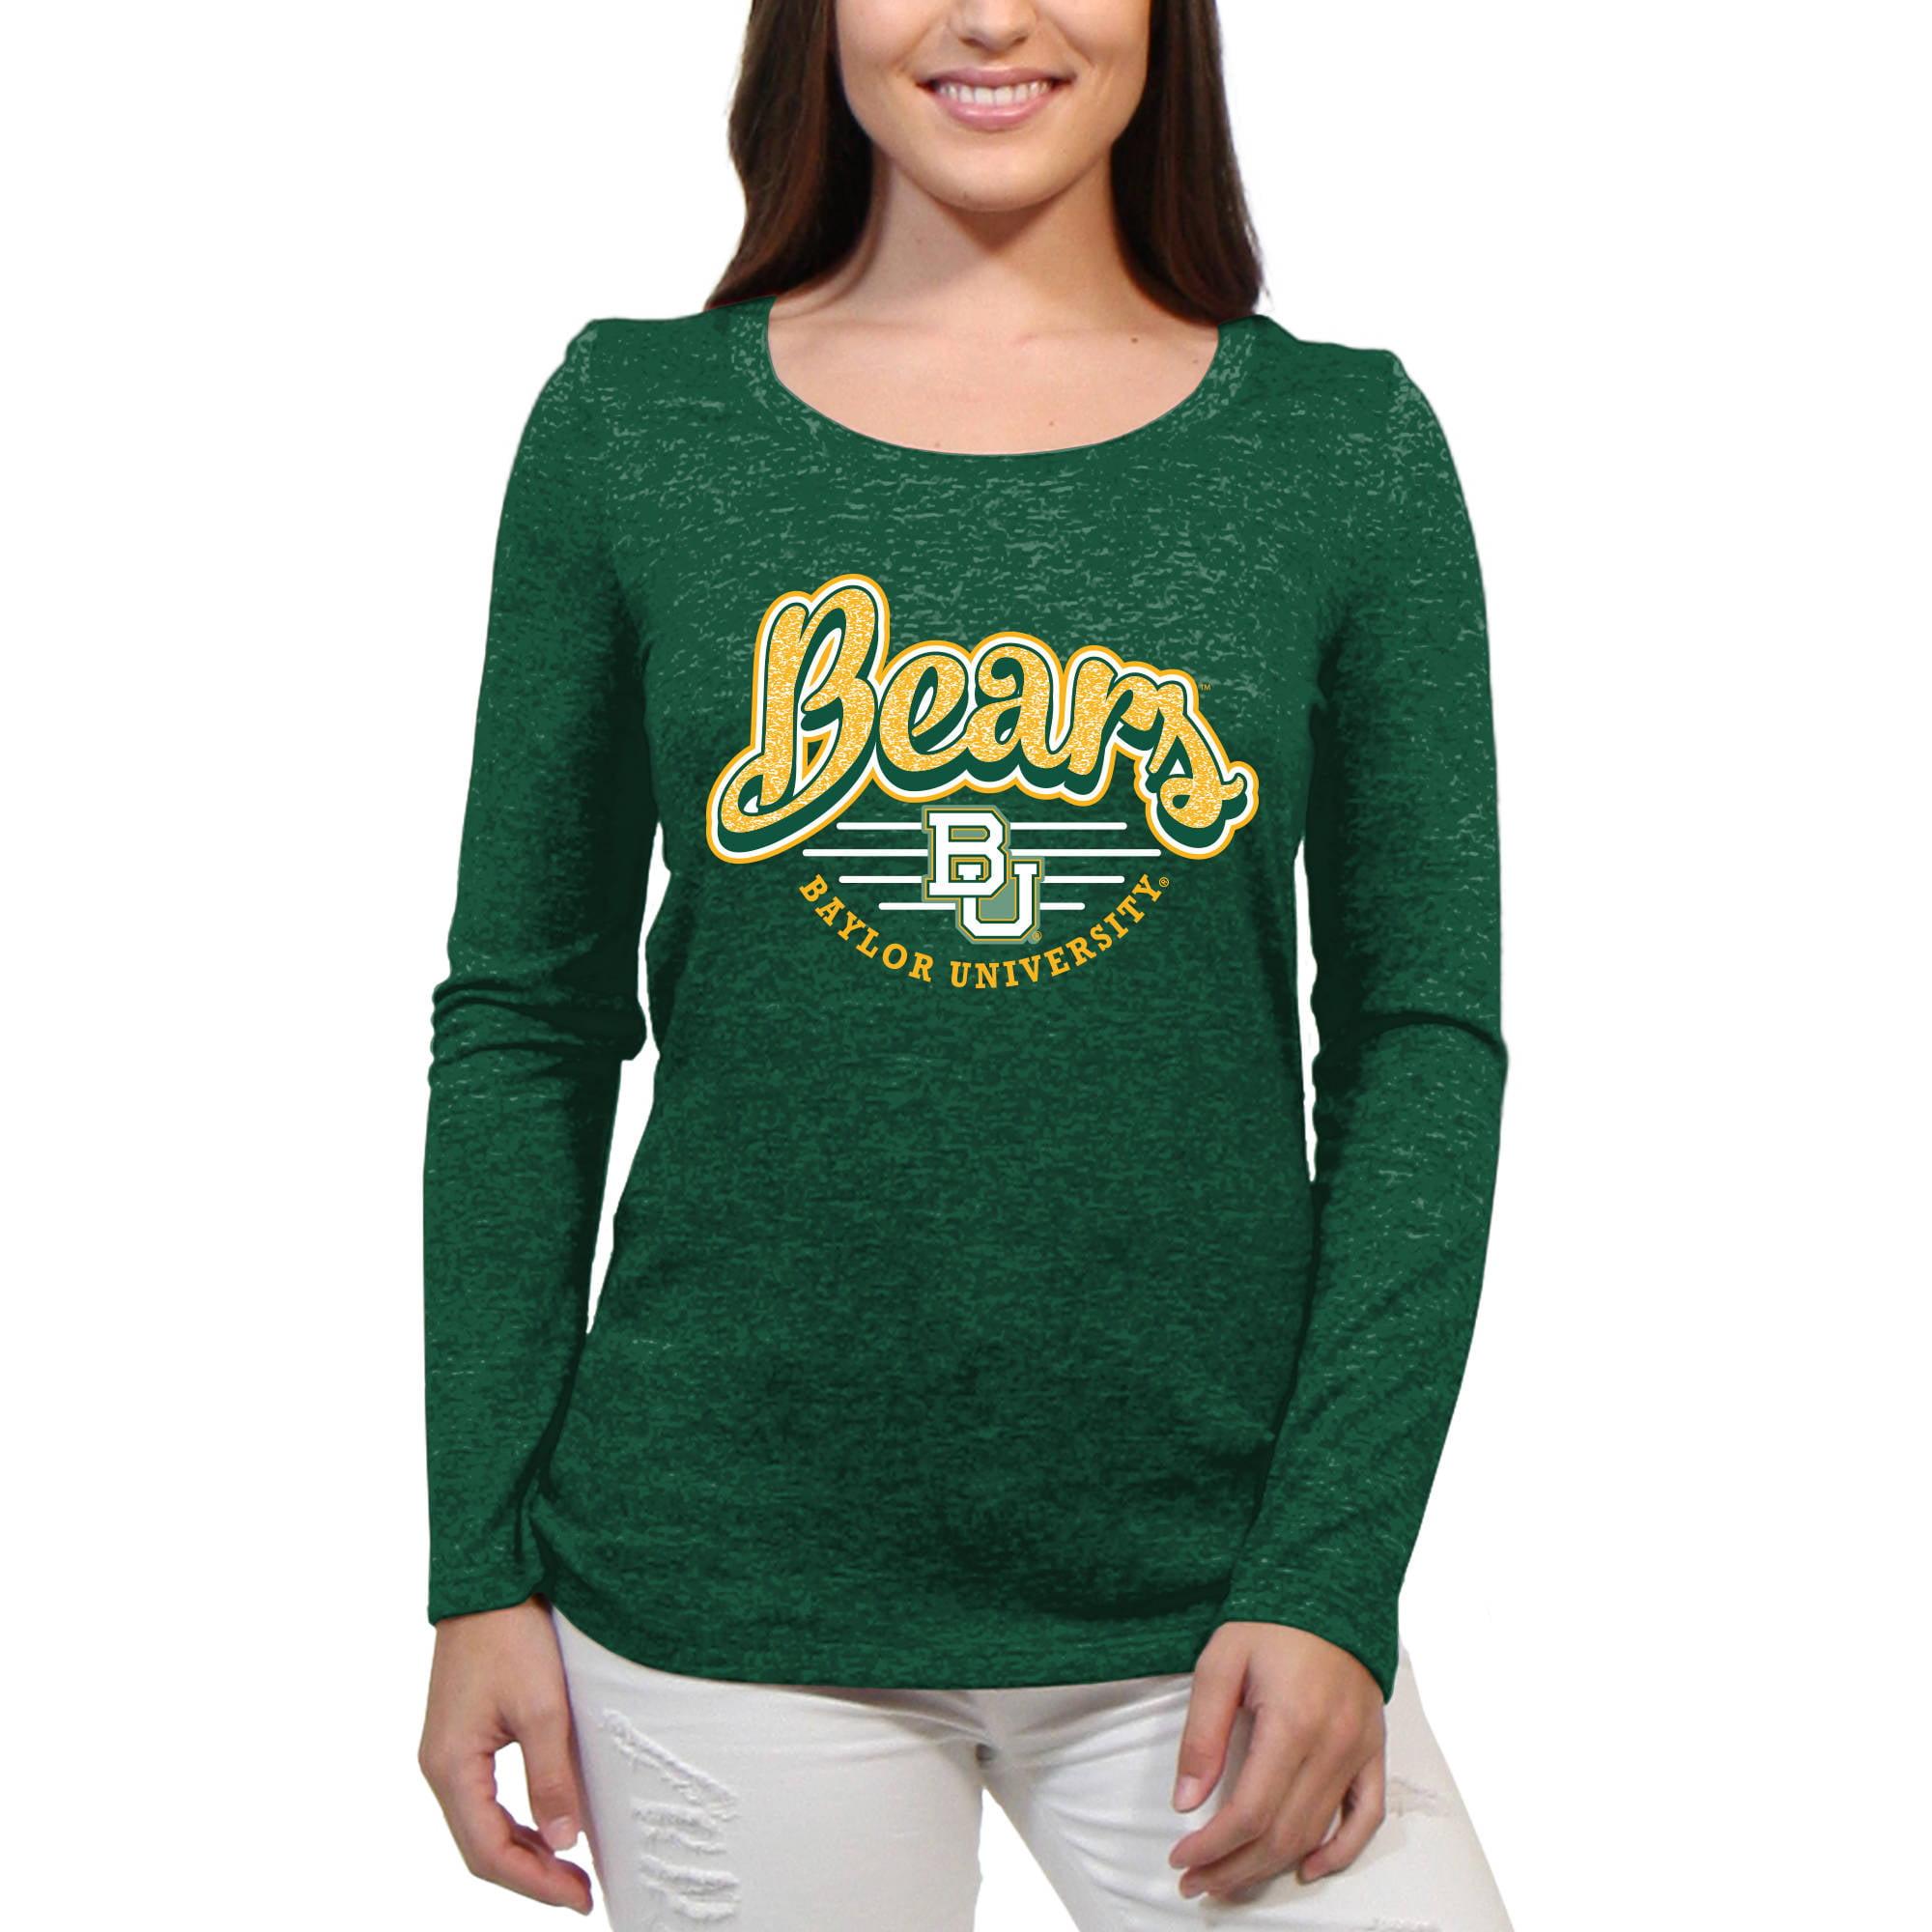 Baylor Bears Funky Script Women'S/Juniors Team Long Sleeve Scoop Neck Shirt